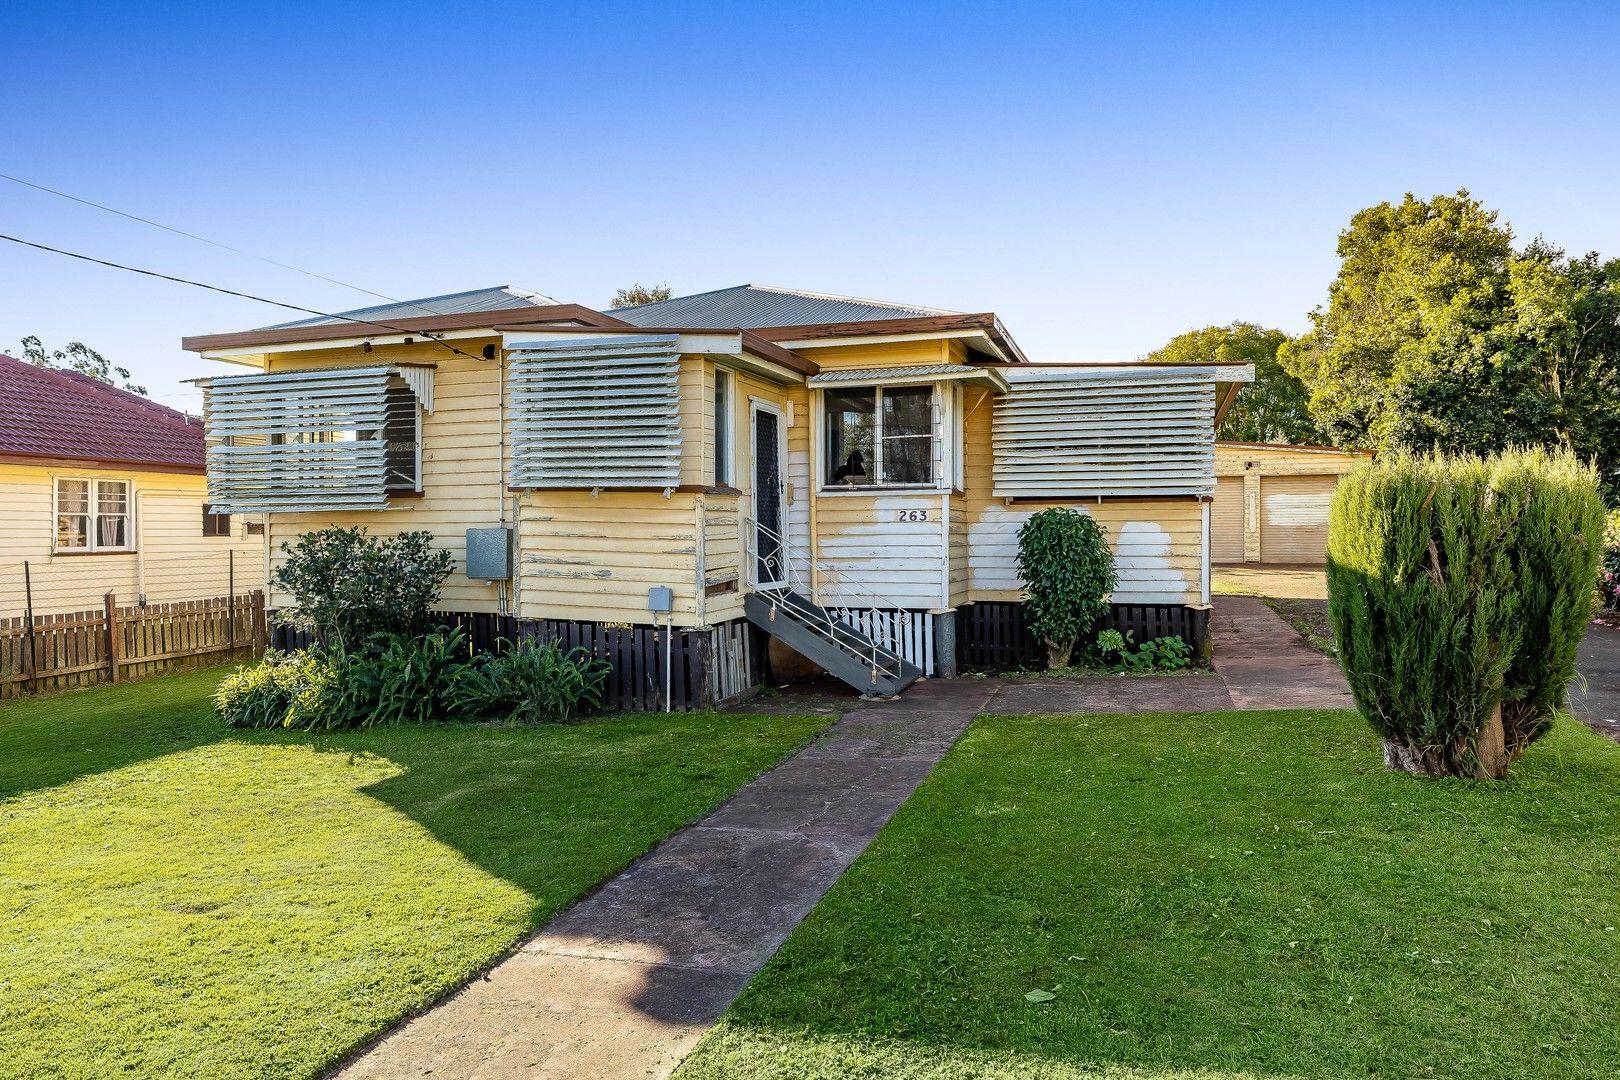 263 Alderley Street, Centenary Heights QLD 4350, Image 0